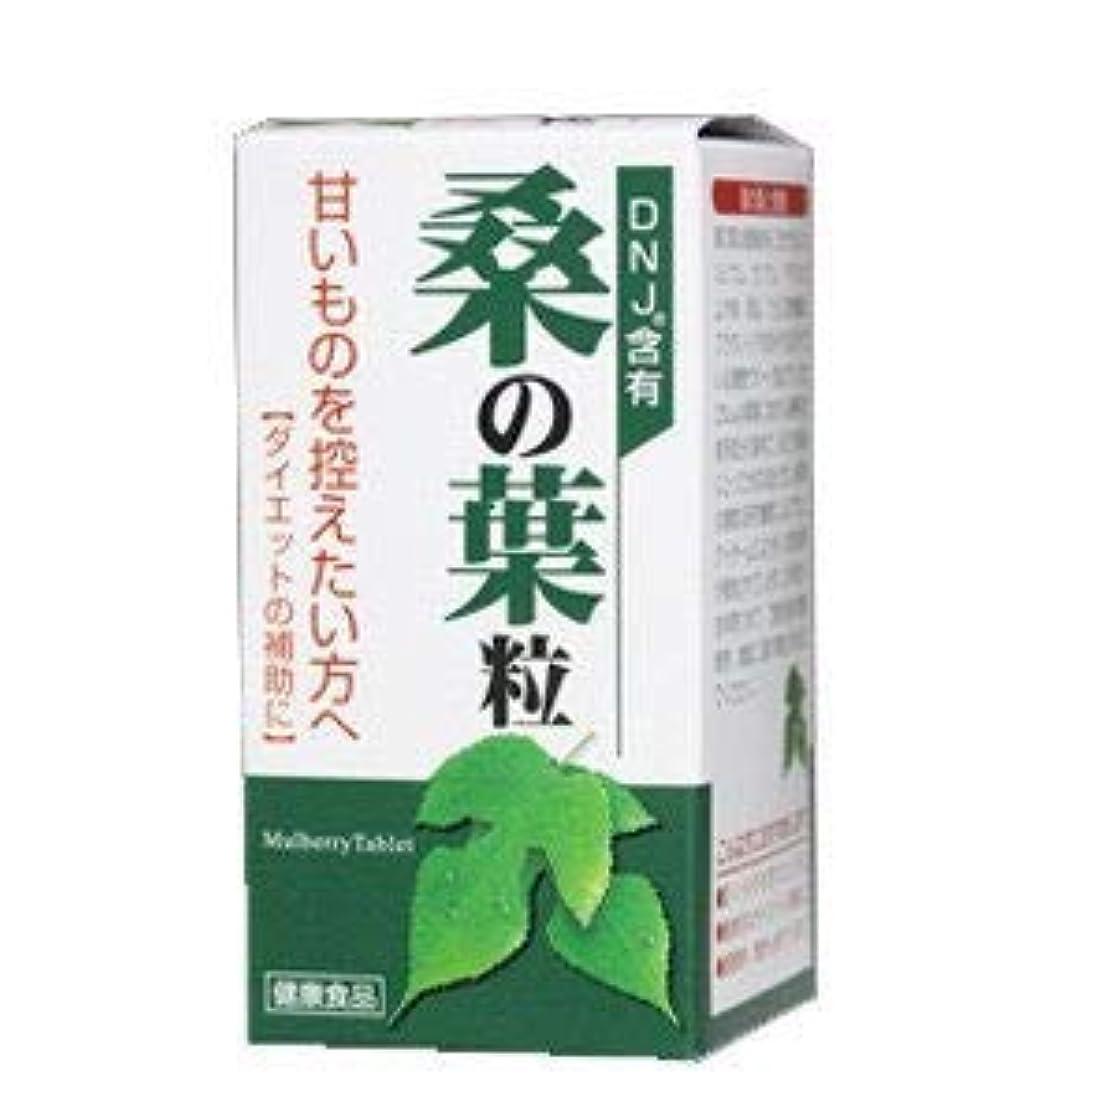 拳不適切な正午桑の葉粒 270粒 3個 大草薬品